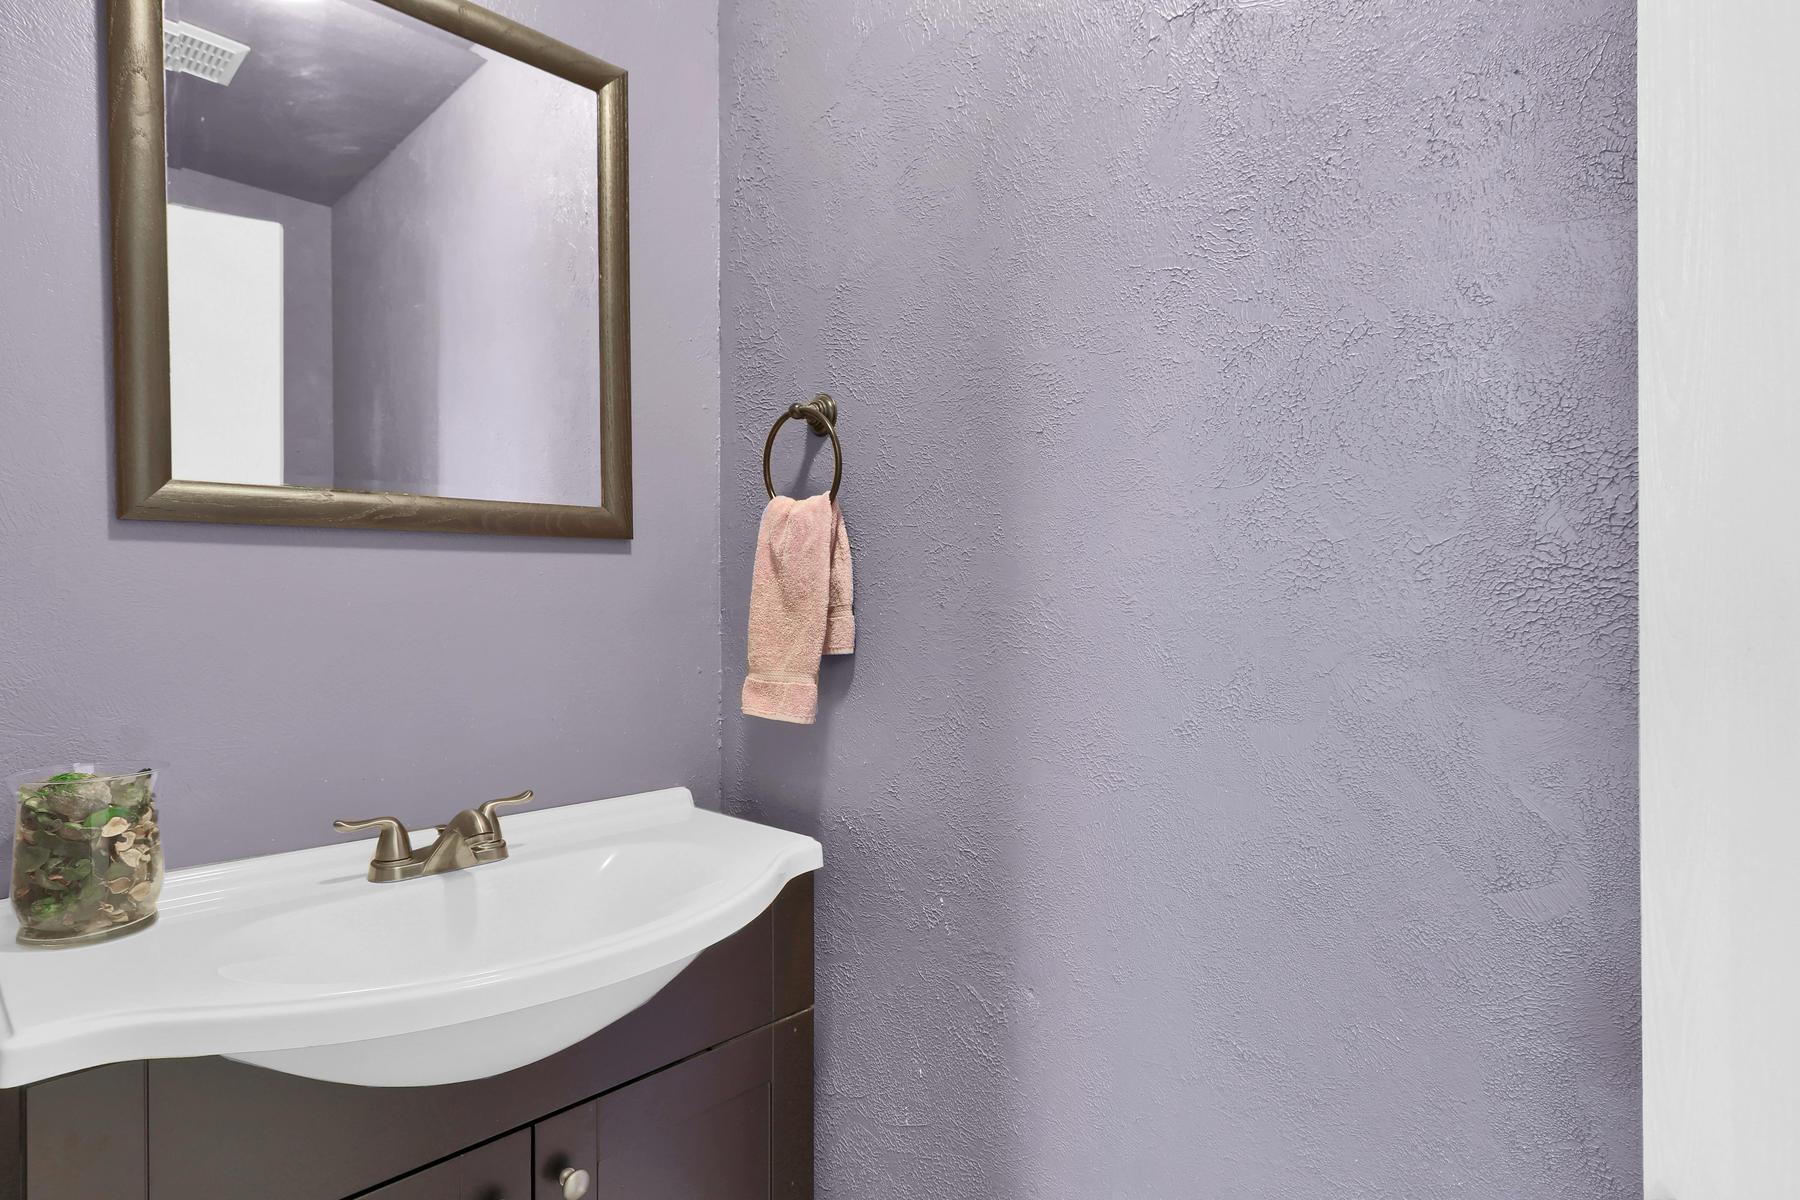 990 W 133rd Cir E Westminster-015-14-Bathroom-MLS_Size.jpg